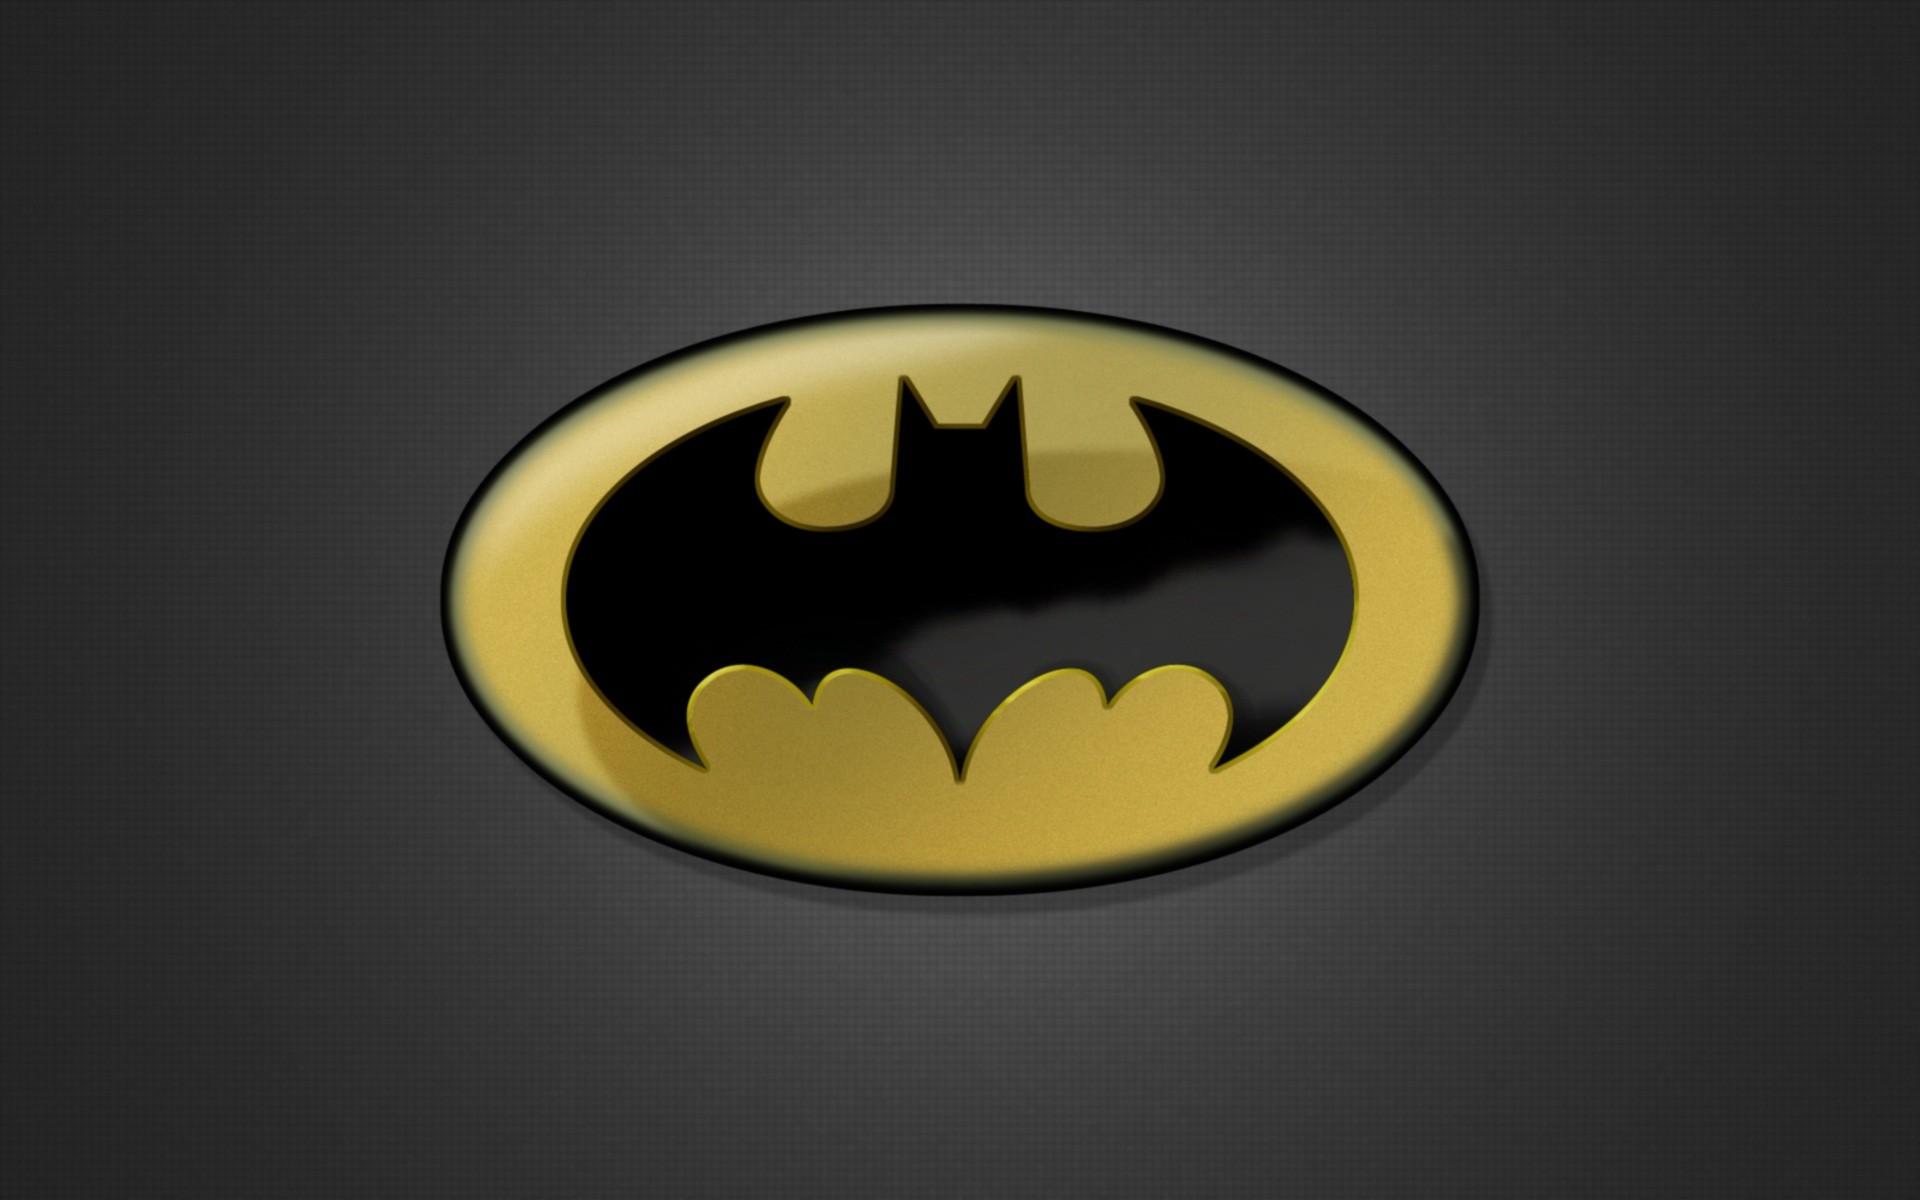 Batman Logo Wallpaper 24031wall.jpg